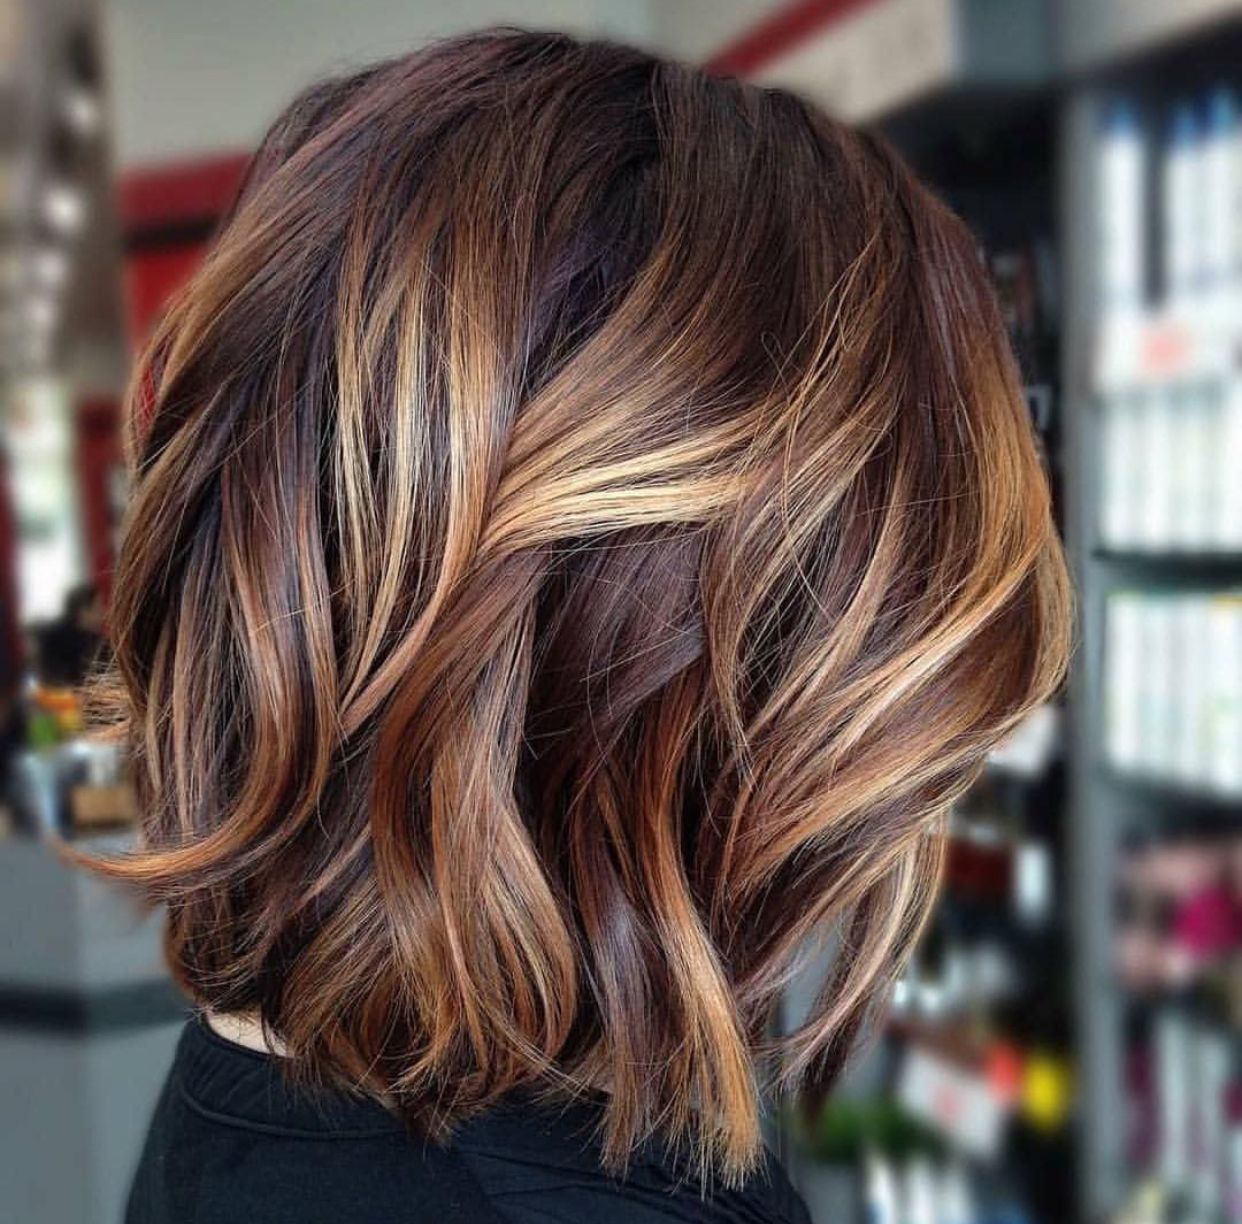 K A T I E Kathryynnicole Hair Styles Gorgeous Hair Color Brown Hair With Blonde Highlights